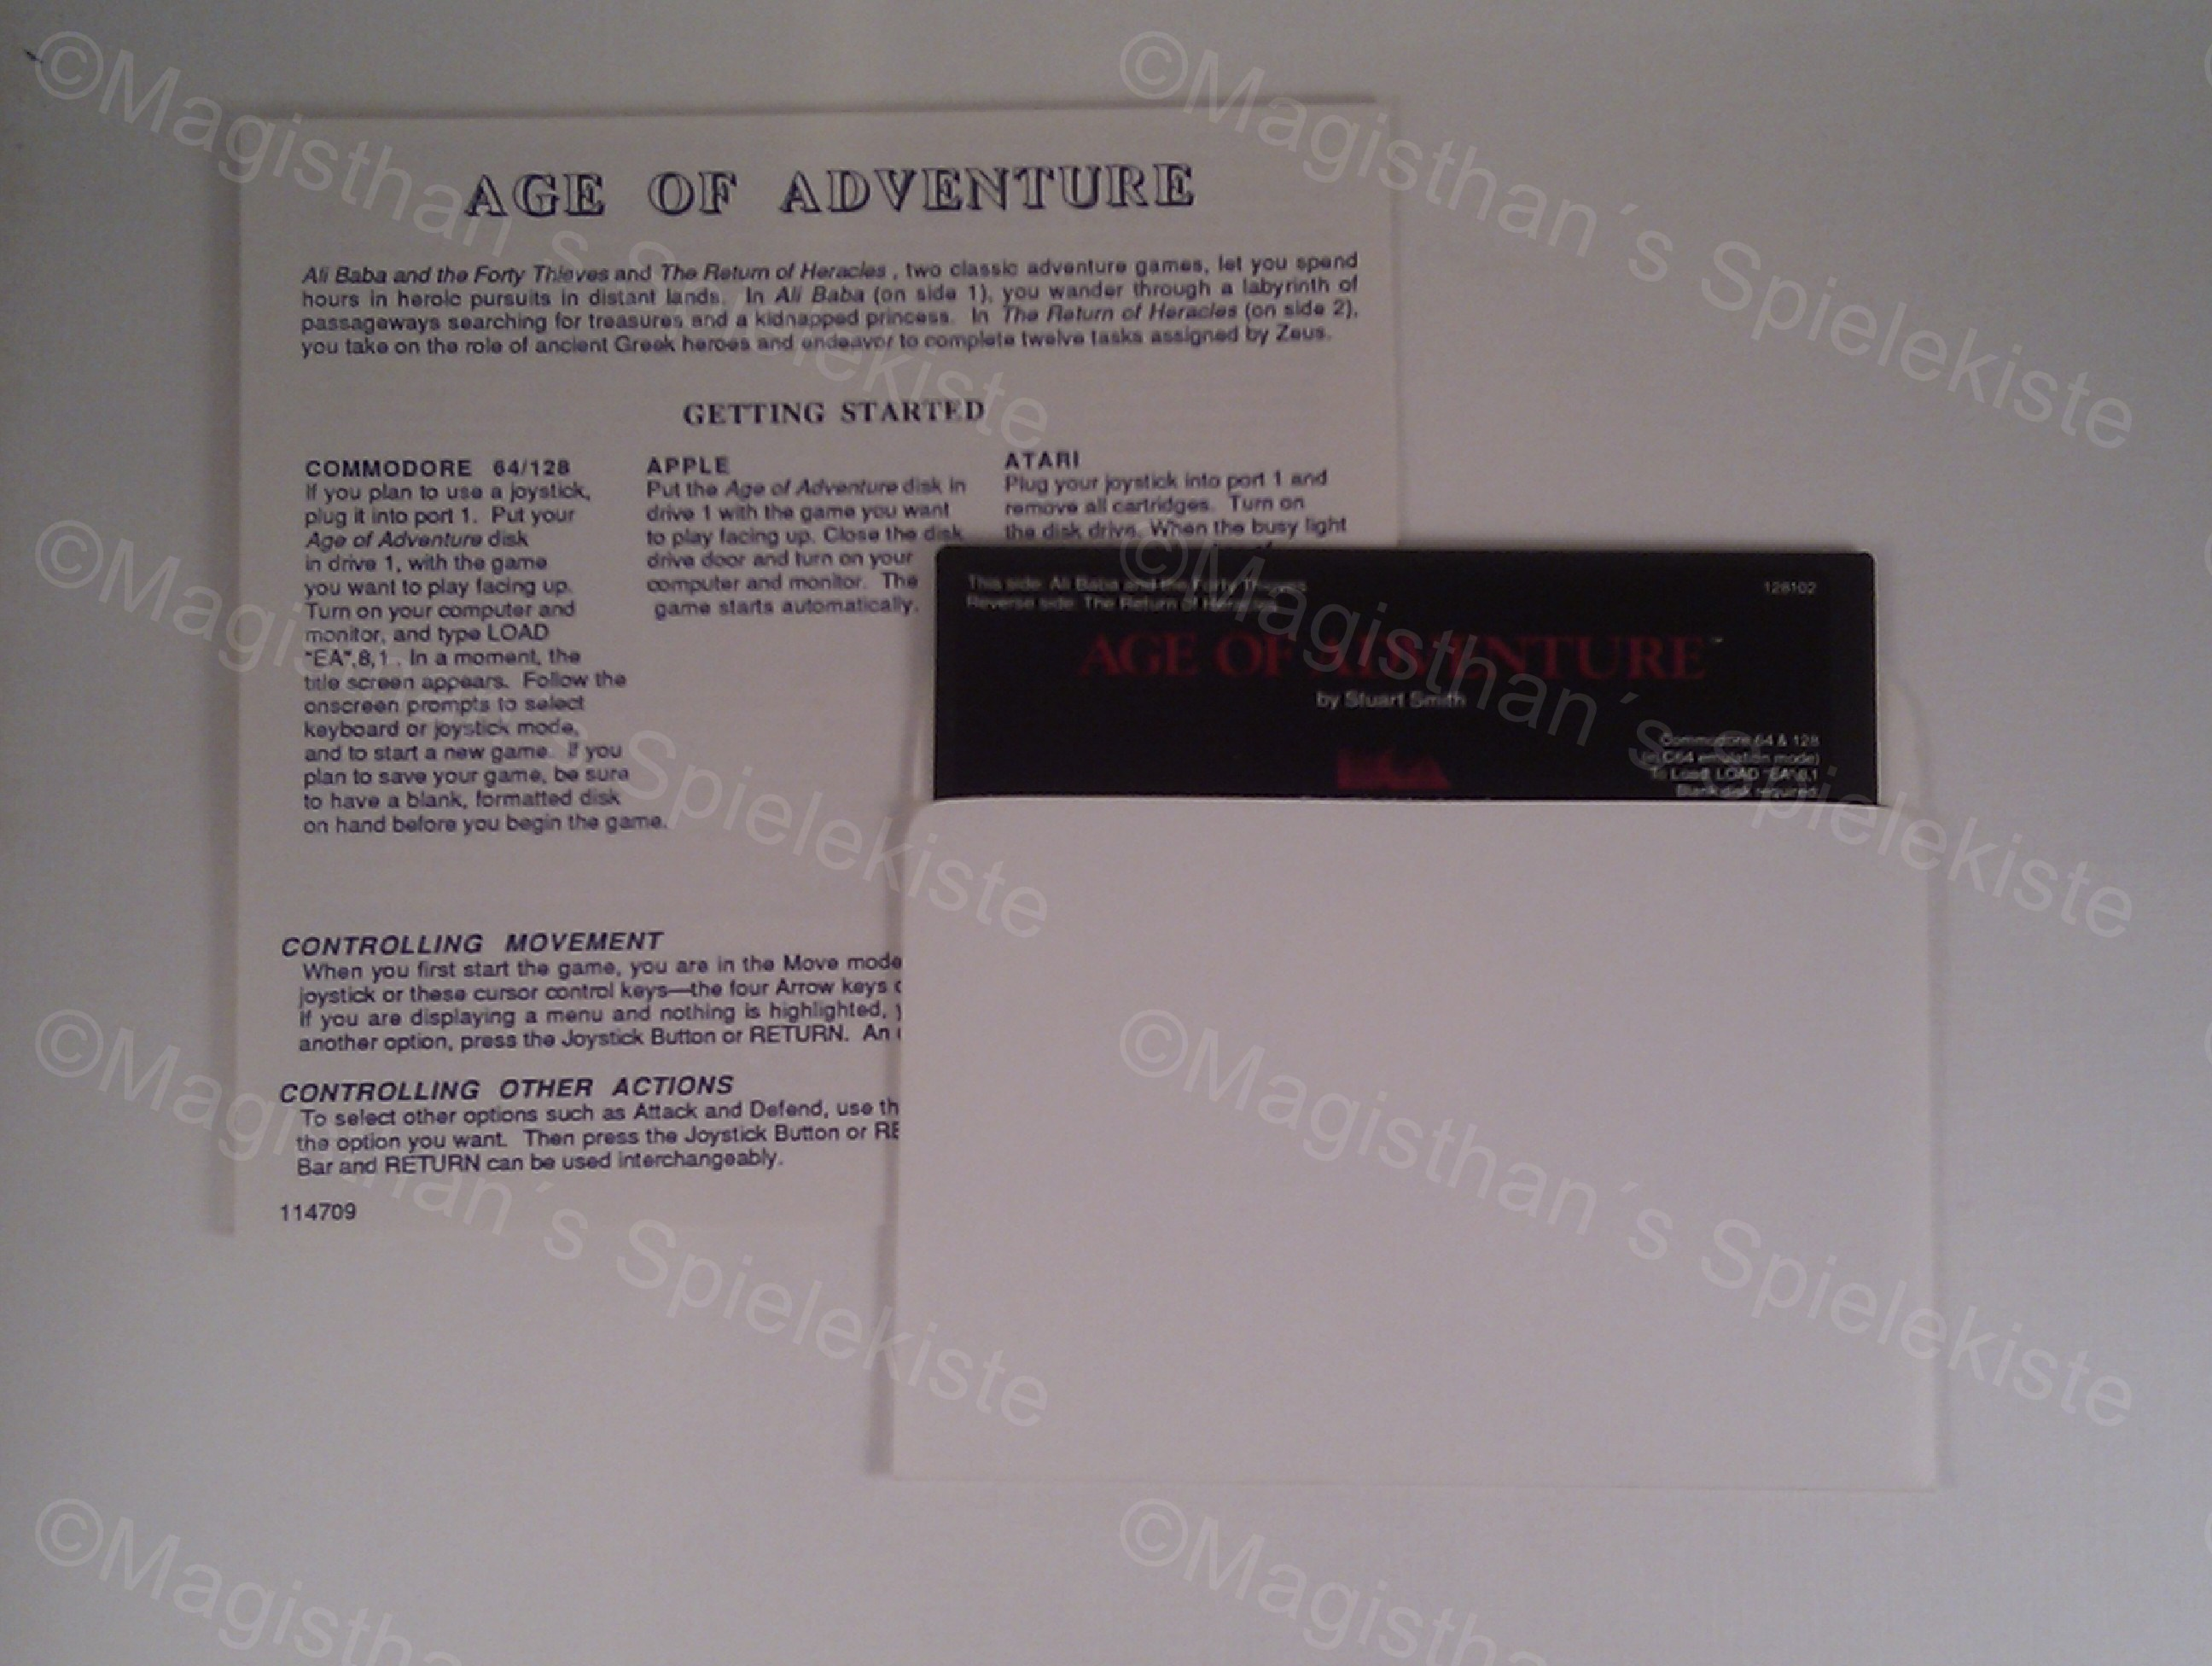 AgeofAdventure2.jpg